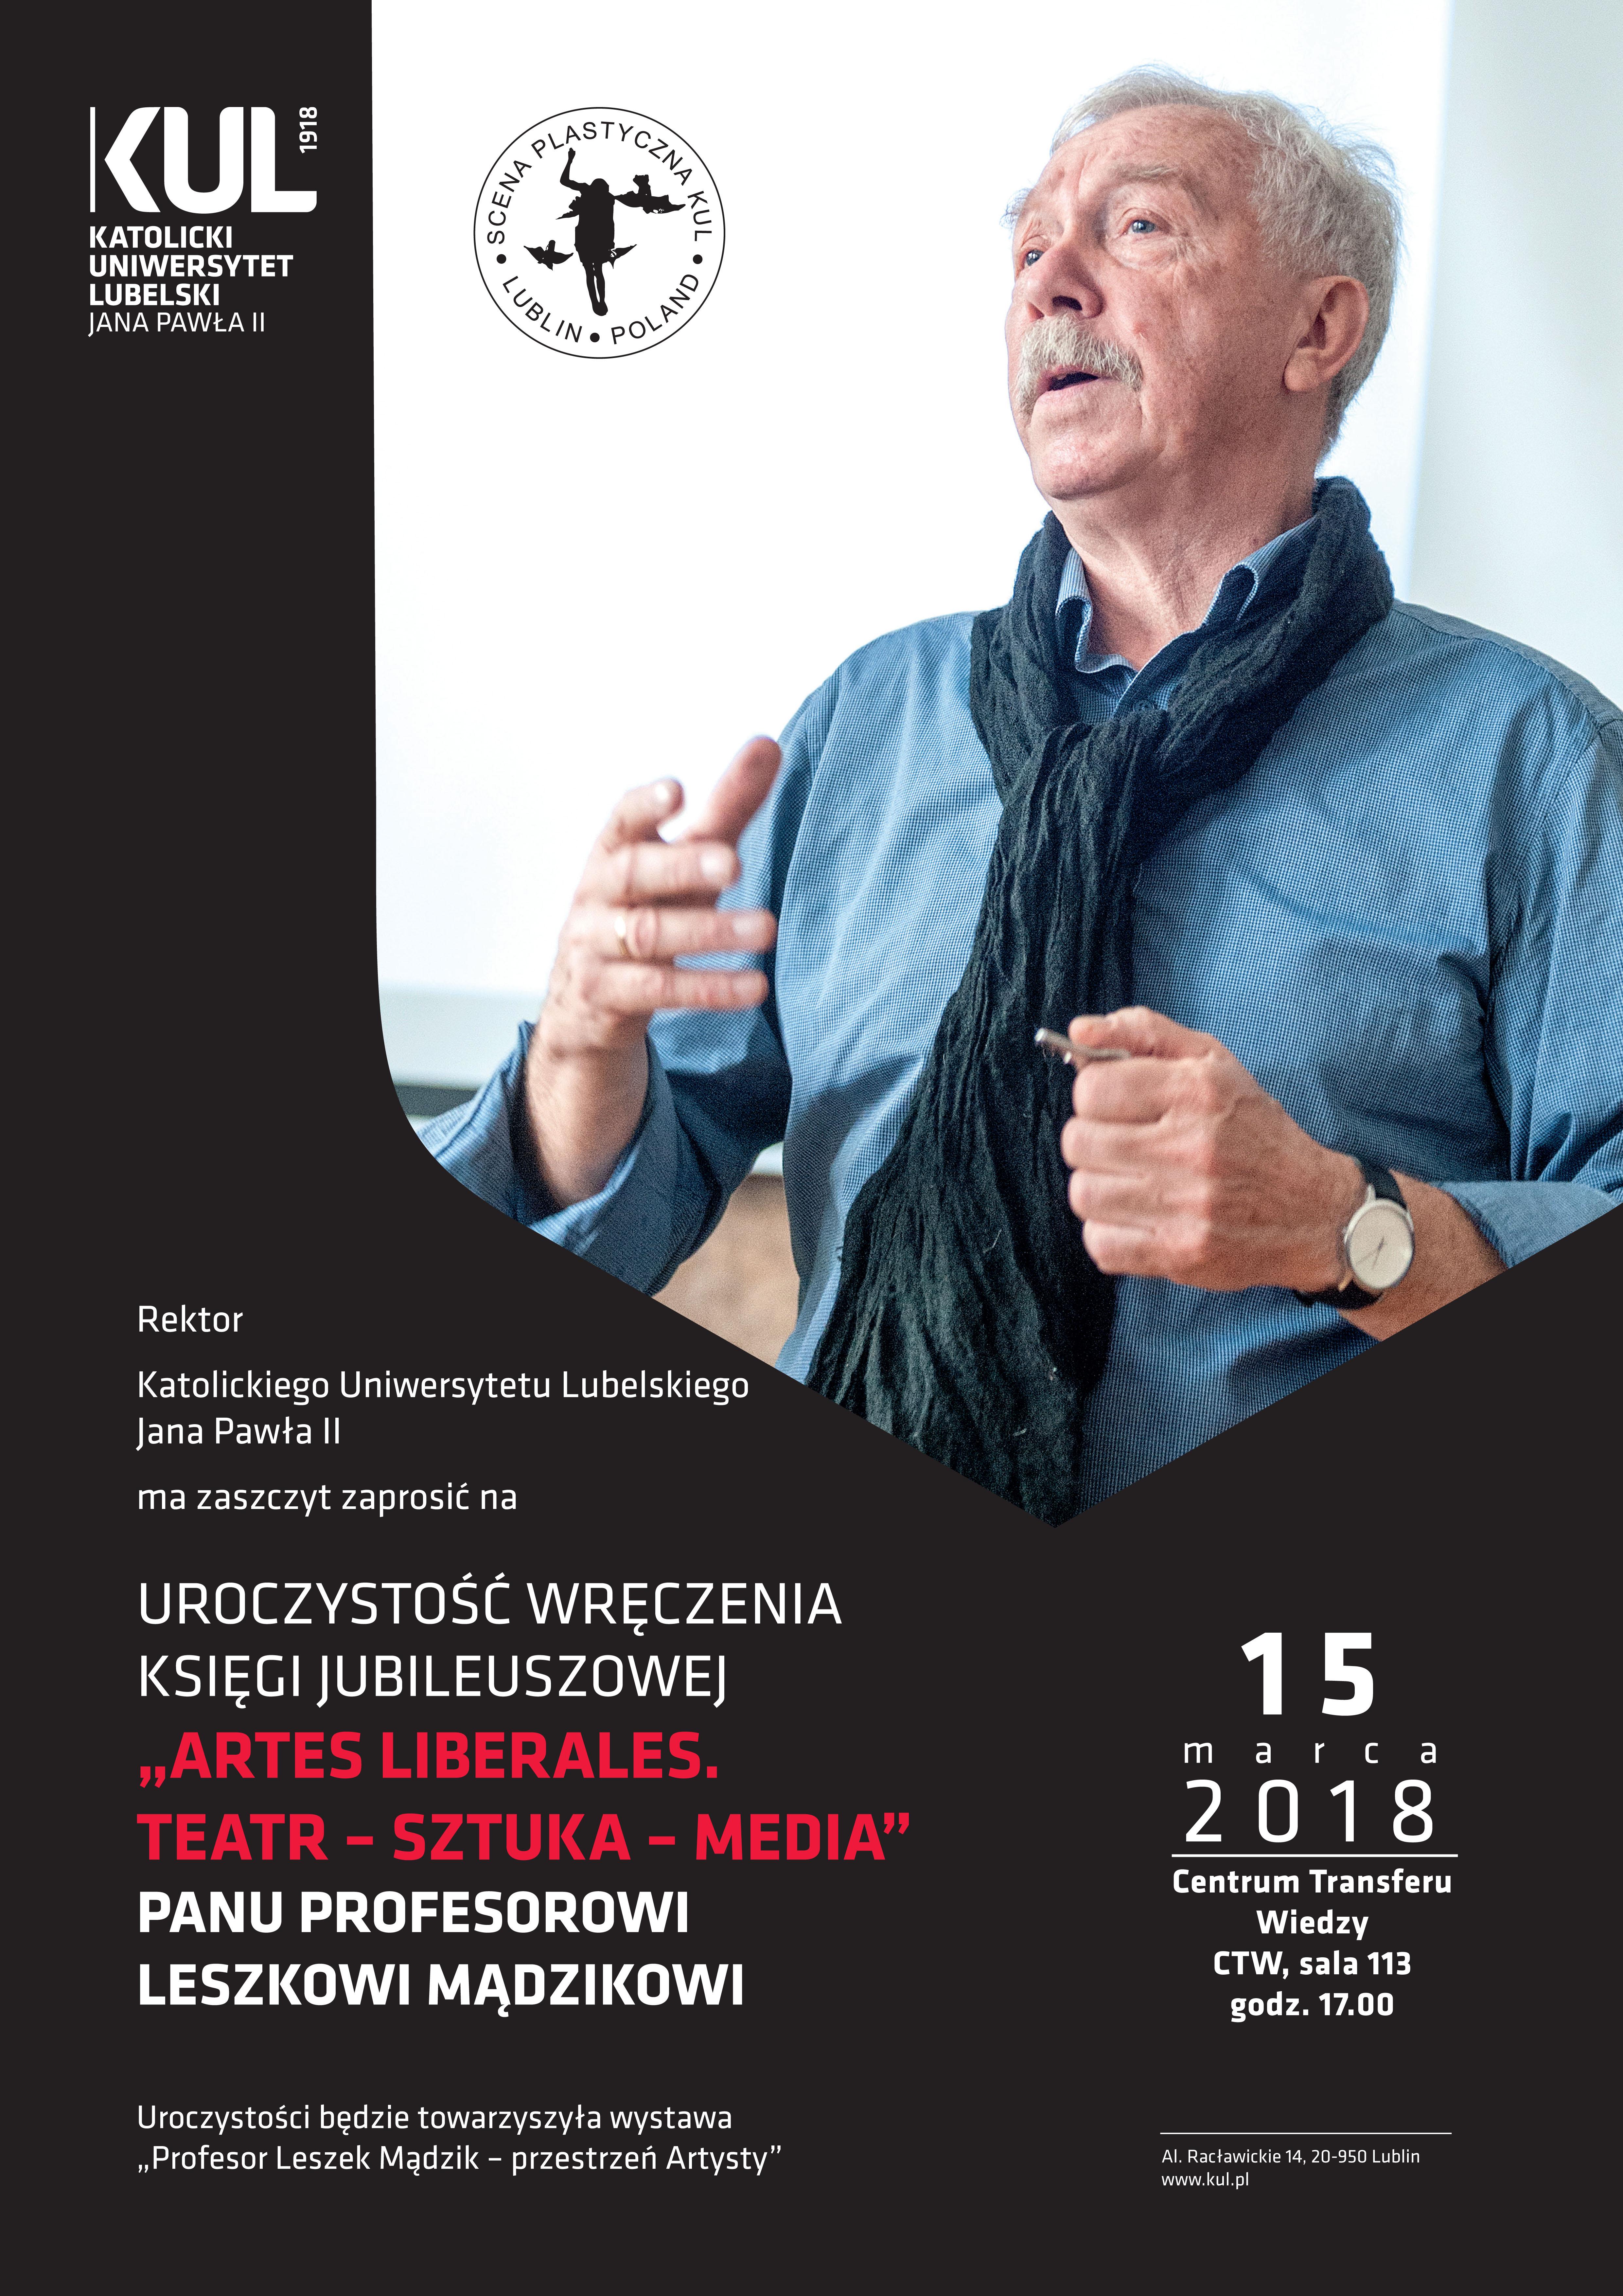 KUL_plakaty_2018_madzik1-2